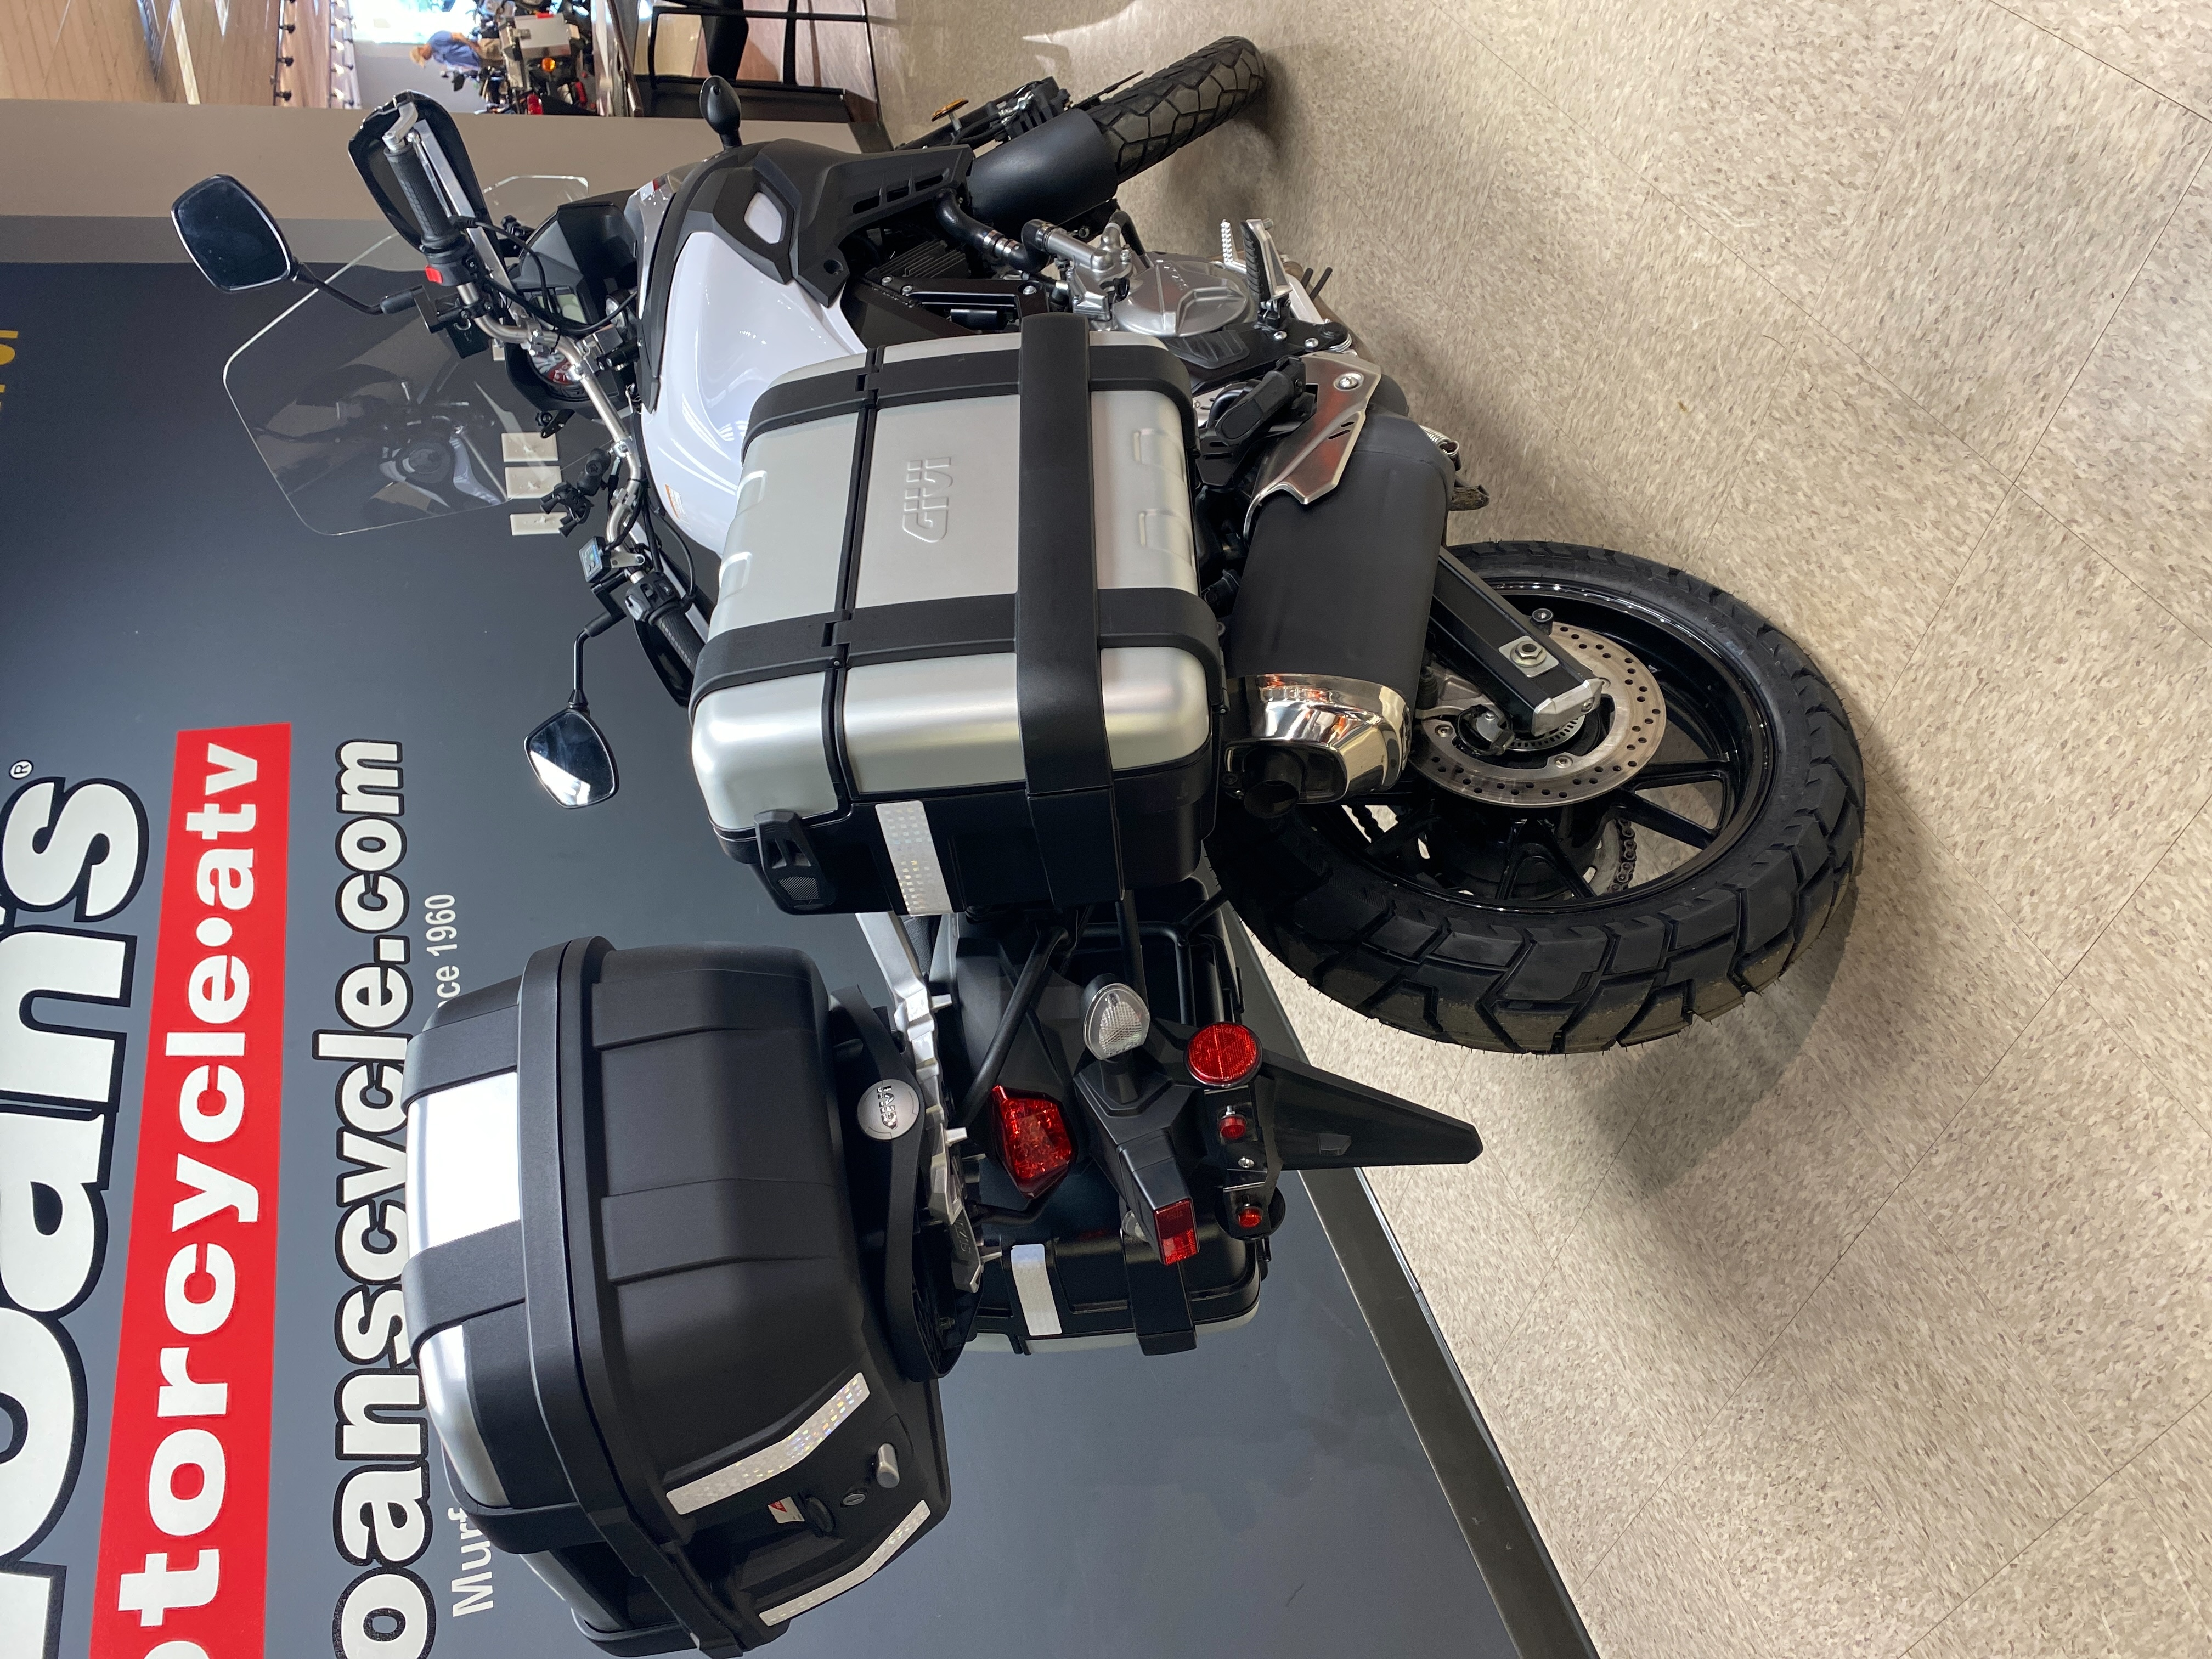 2017 Suzuki V-Strom 650 XT at Sloans Motorcycle ATV, Murfreesboro, TN, 37129